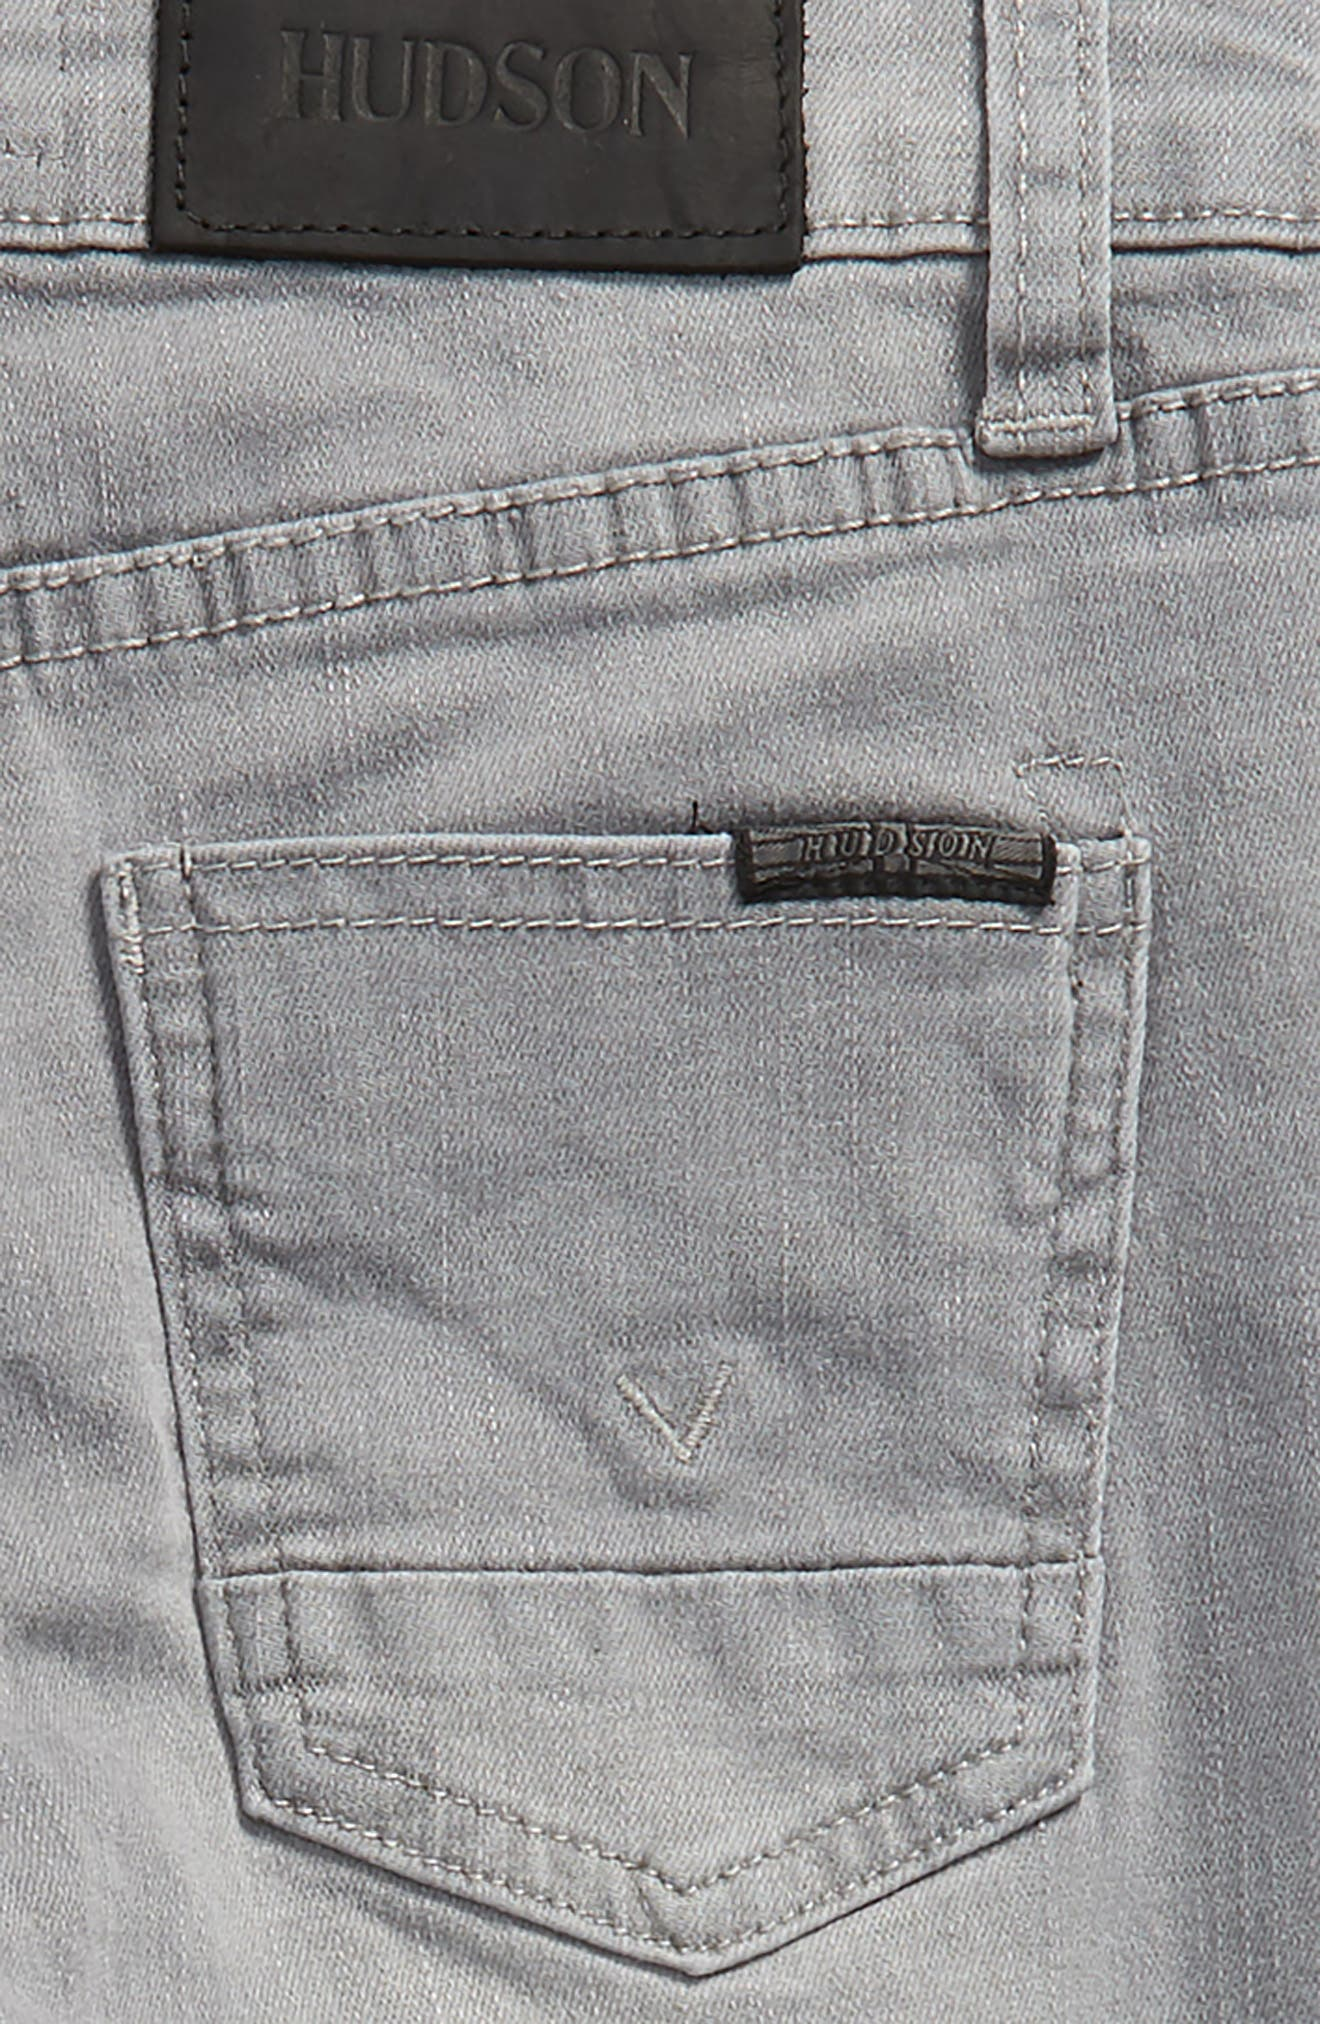 Jude Slim Fit Skinny Jeans,                             Alternate thumbnail 3, color,                             051